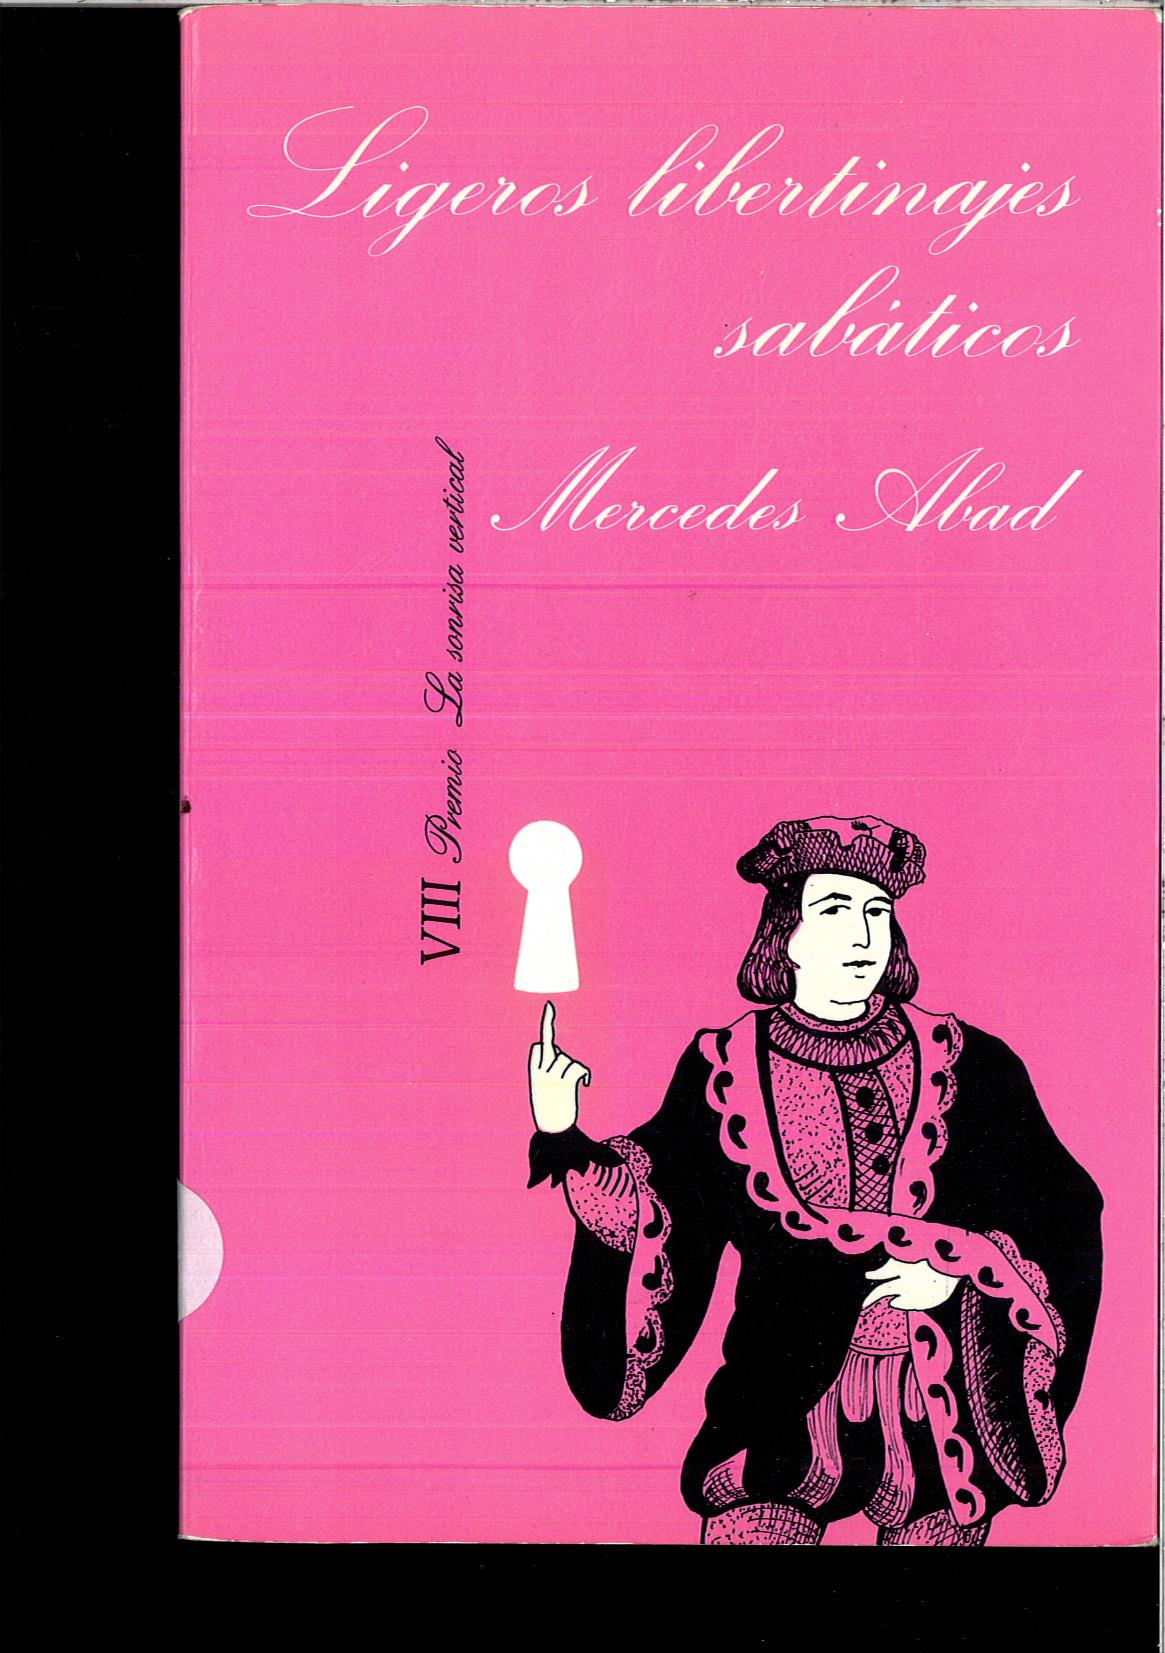 Ligeros libertinajes sabaticos de mercedes abad uniliber - Libreria hispanoamericana barcelona ...